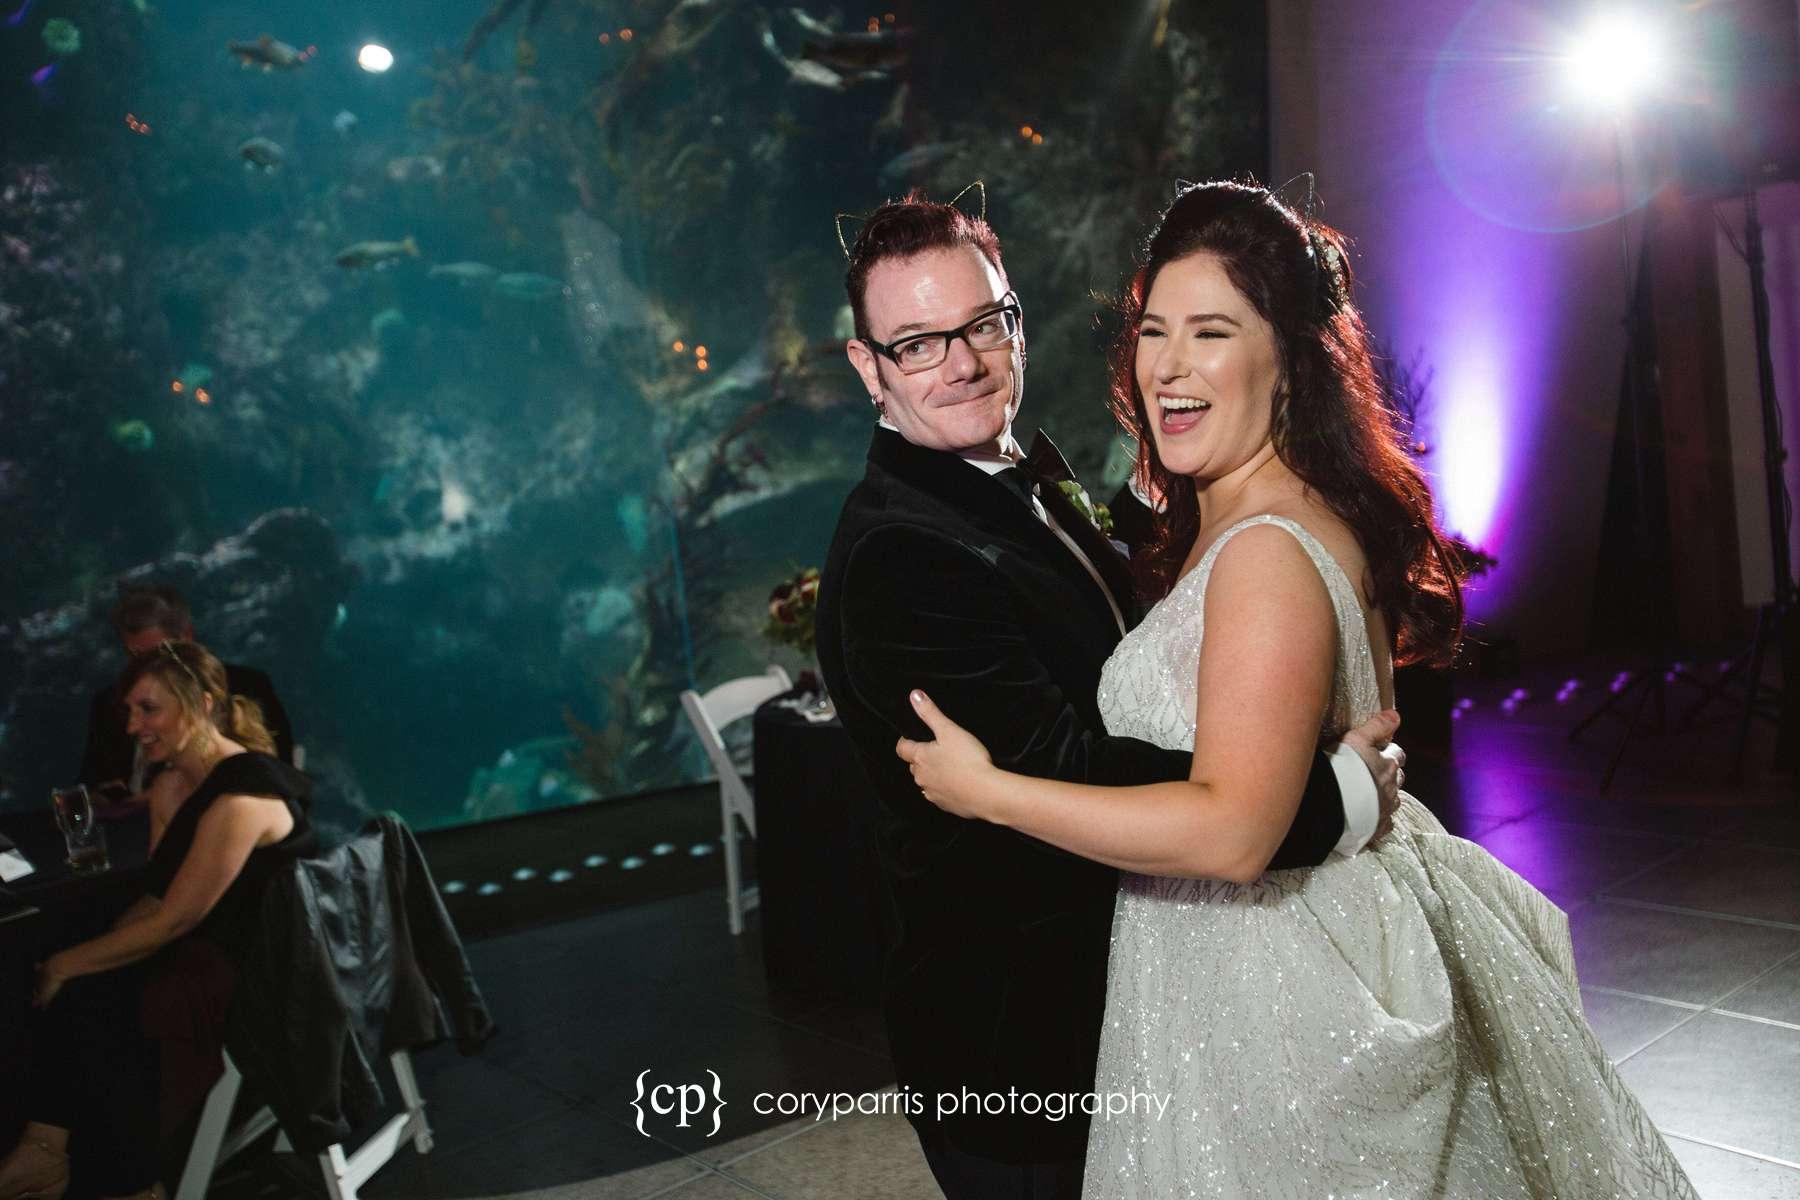 Dancing at Seattle Aquarium wedding reception